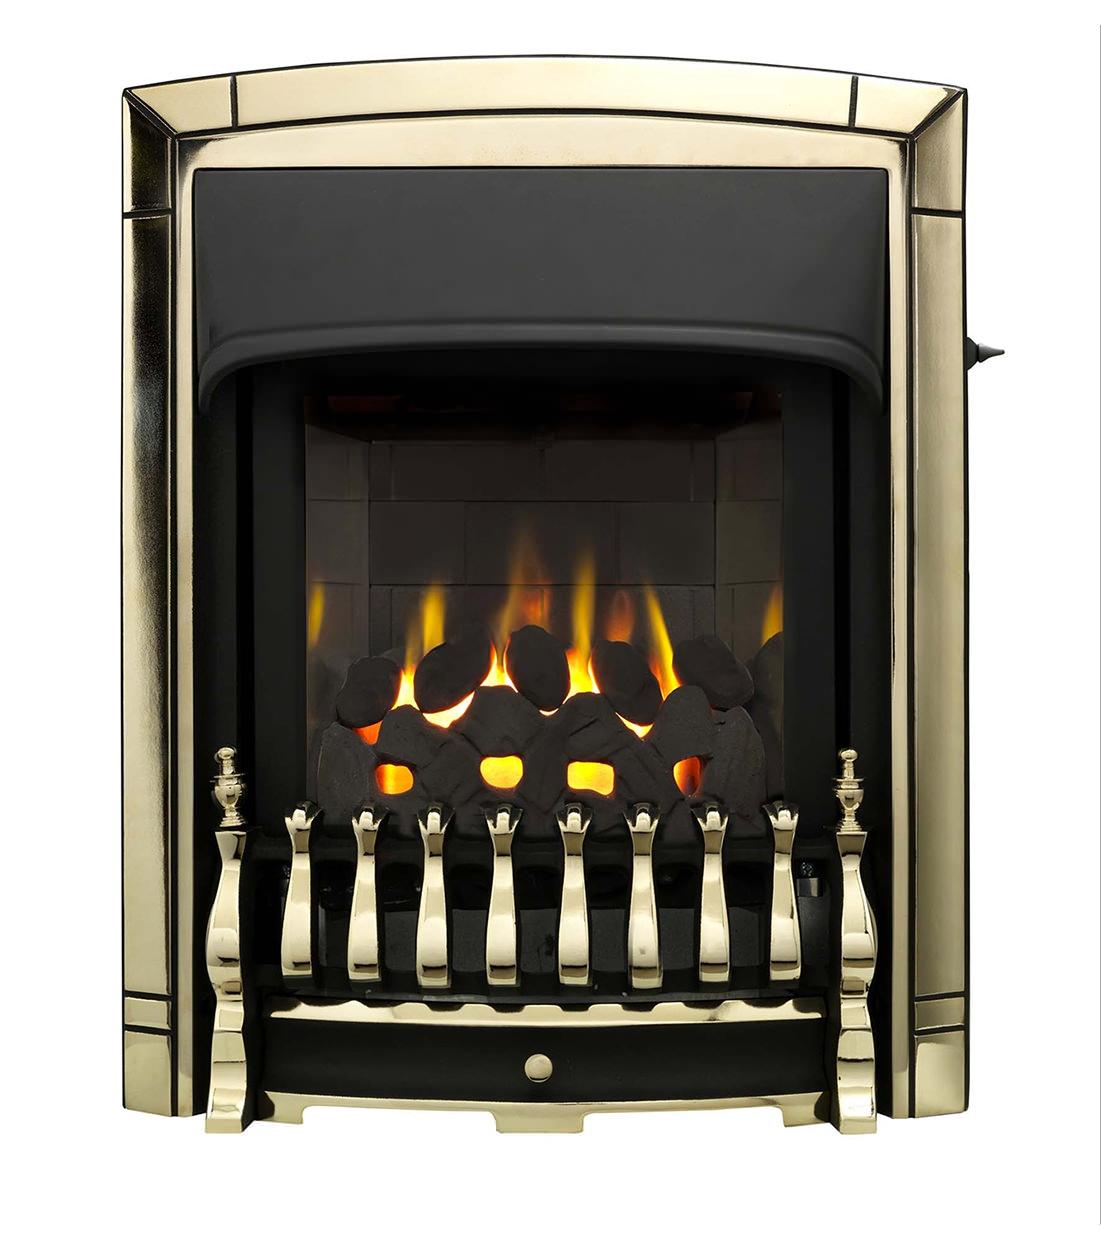 valor dream slimline homeflame slide control inset gas fire gold